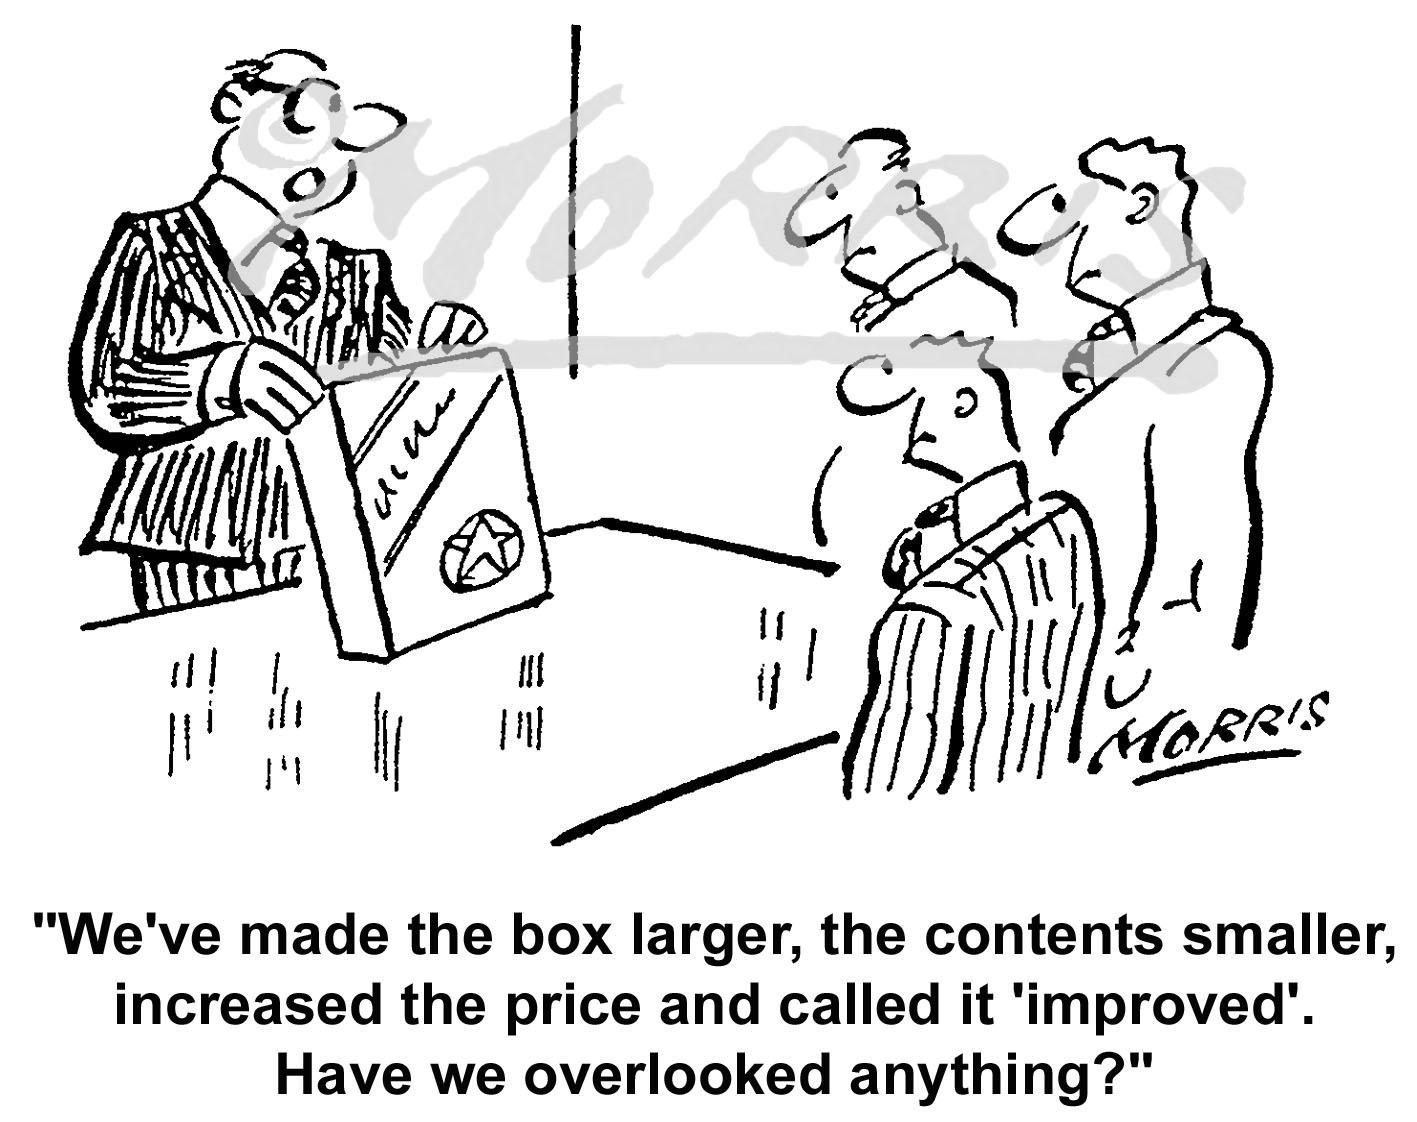 Sales marketing cartoon – Ref: 5120bw